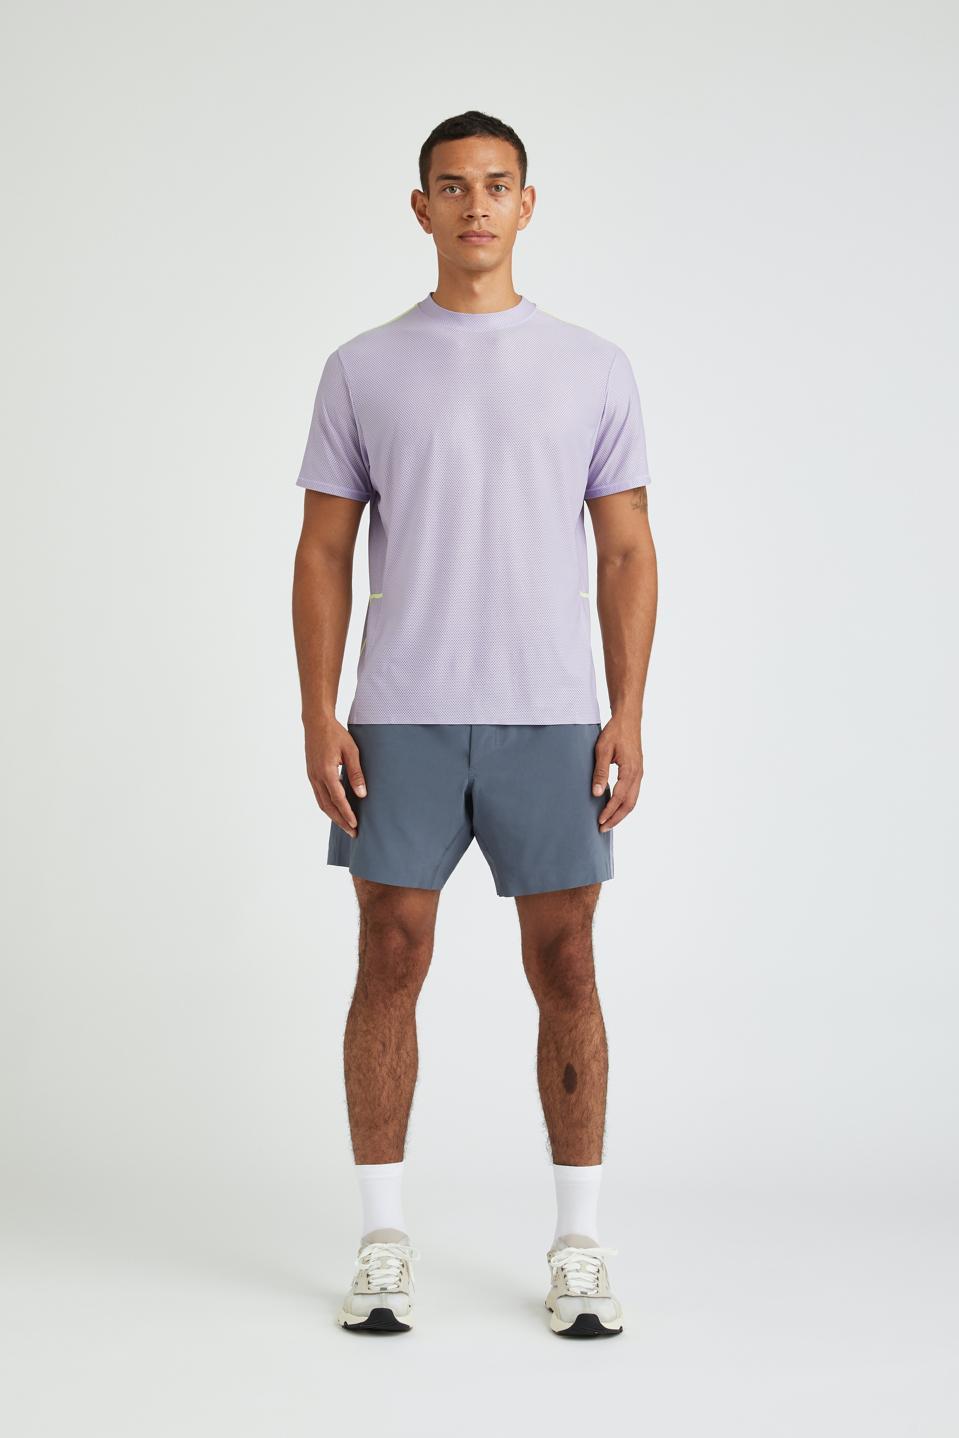 Torsa micro-mesh performance t-shirt